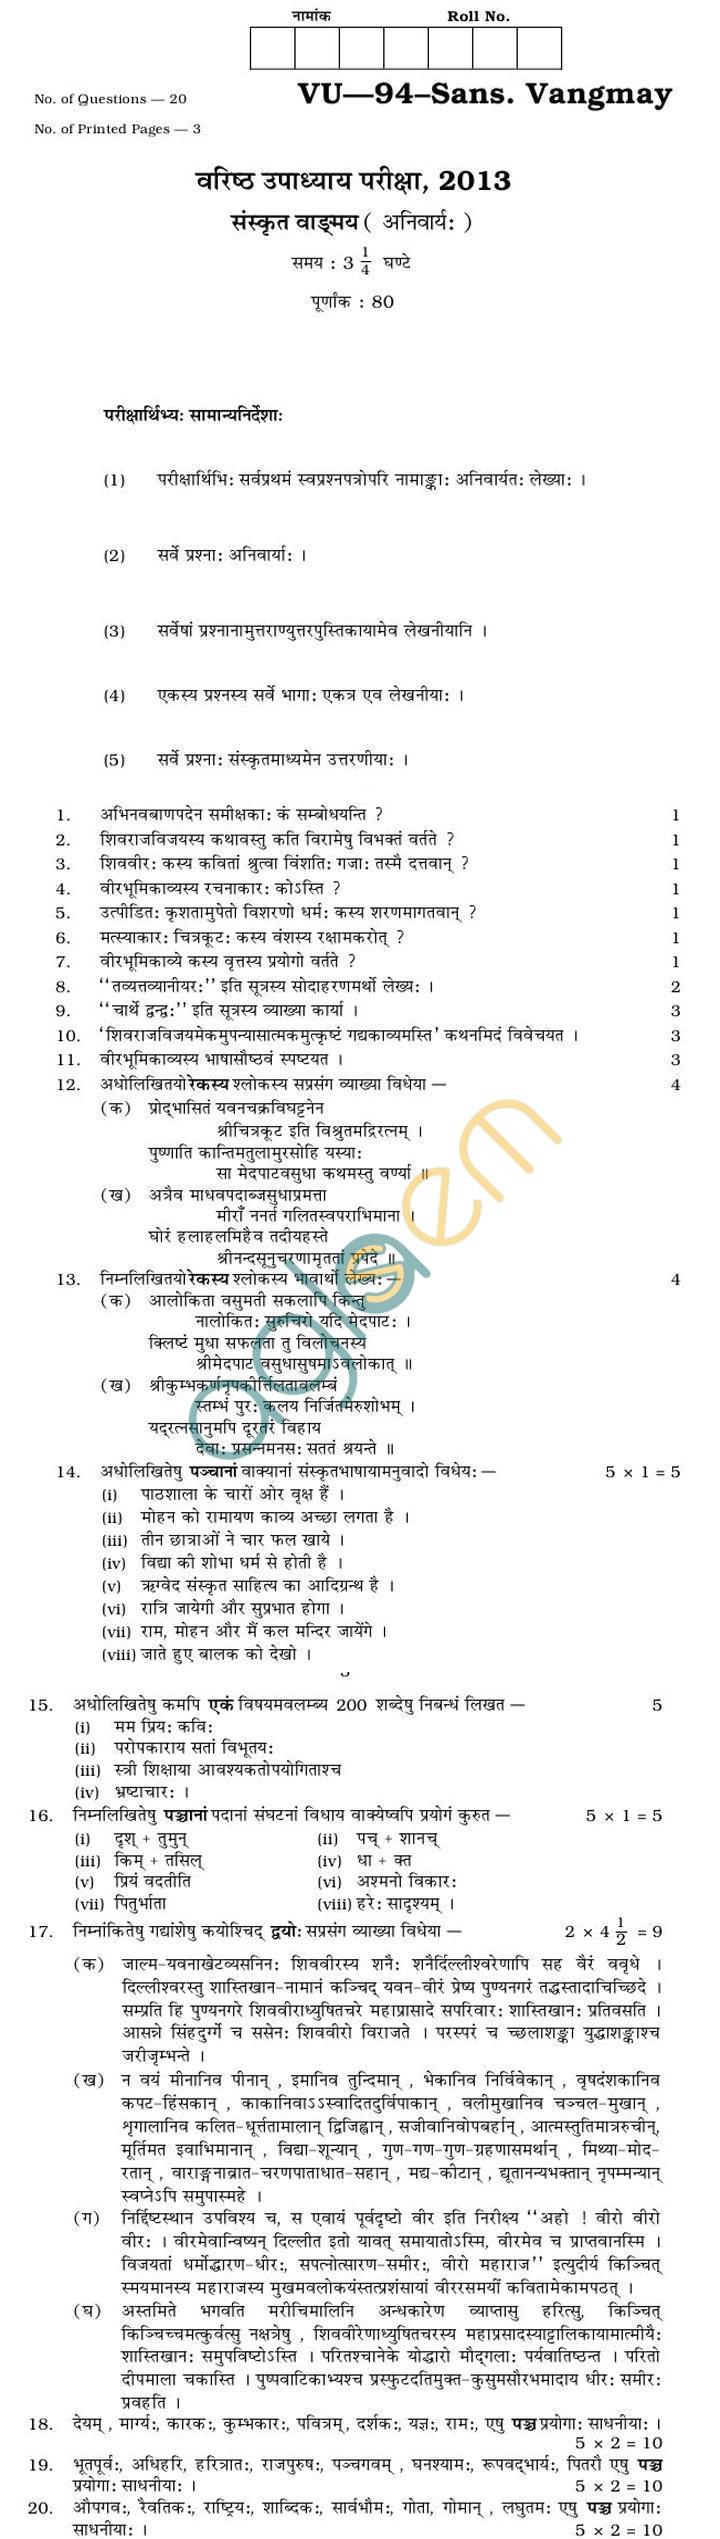 Rajasthan Board V Upadhyay Sanskrit Vangamay Question Paper 2013